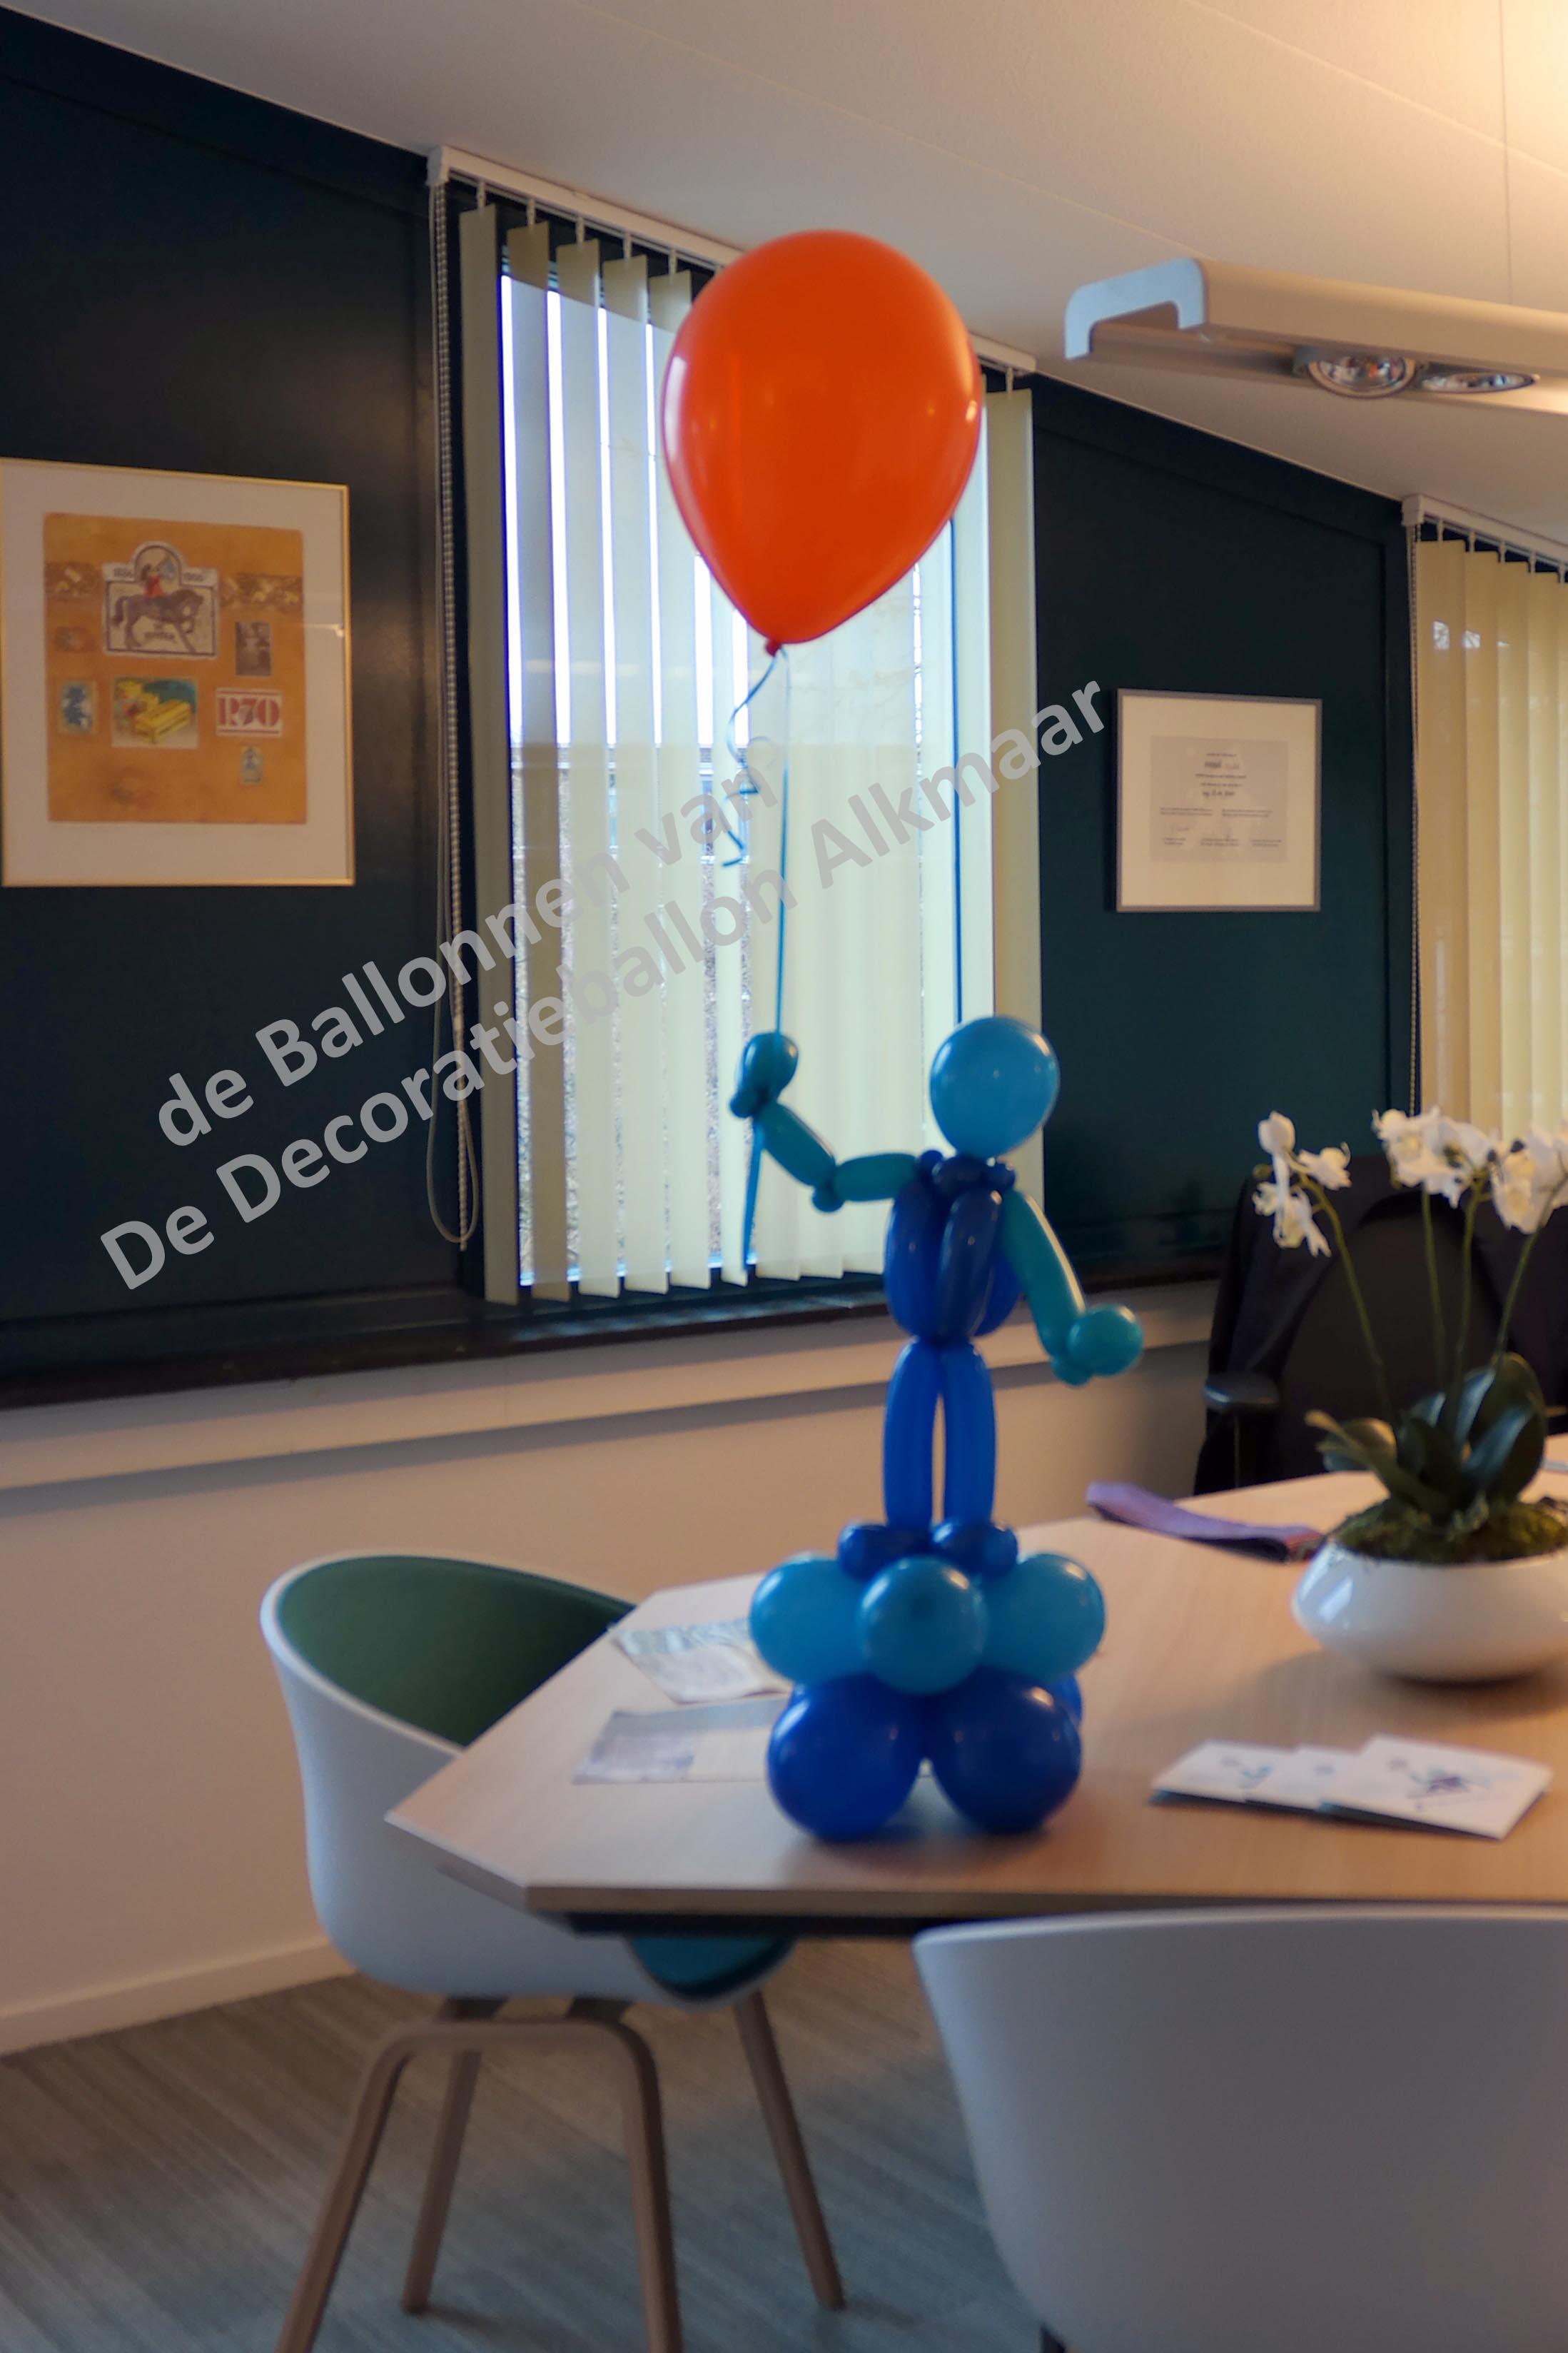 Kakes waal tafel decoratie de ballonnen alkmaar for Ballonnen tafels